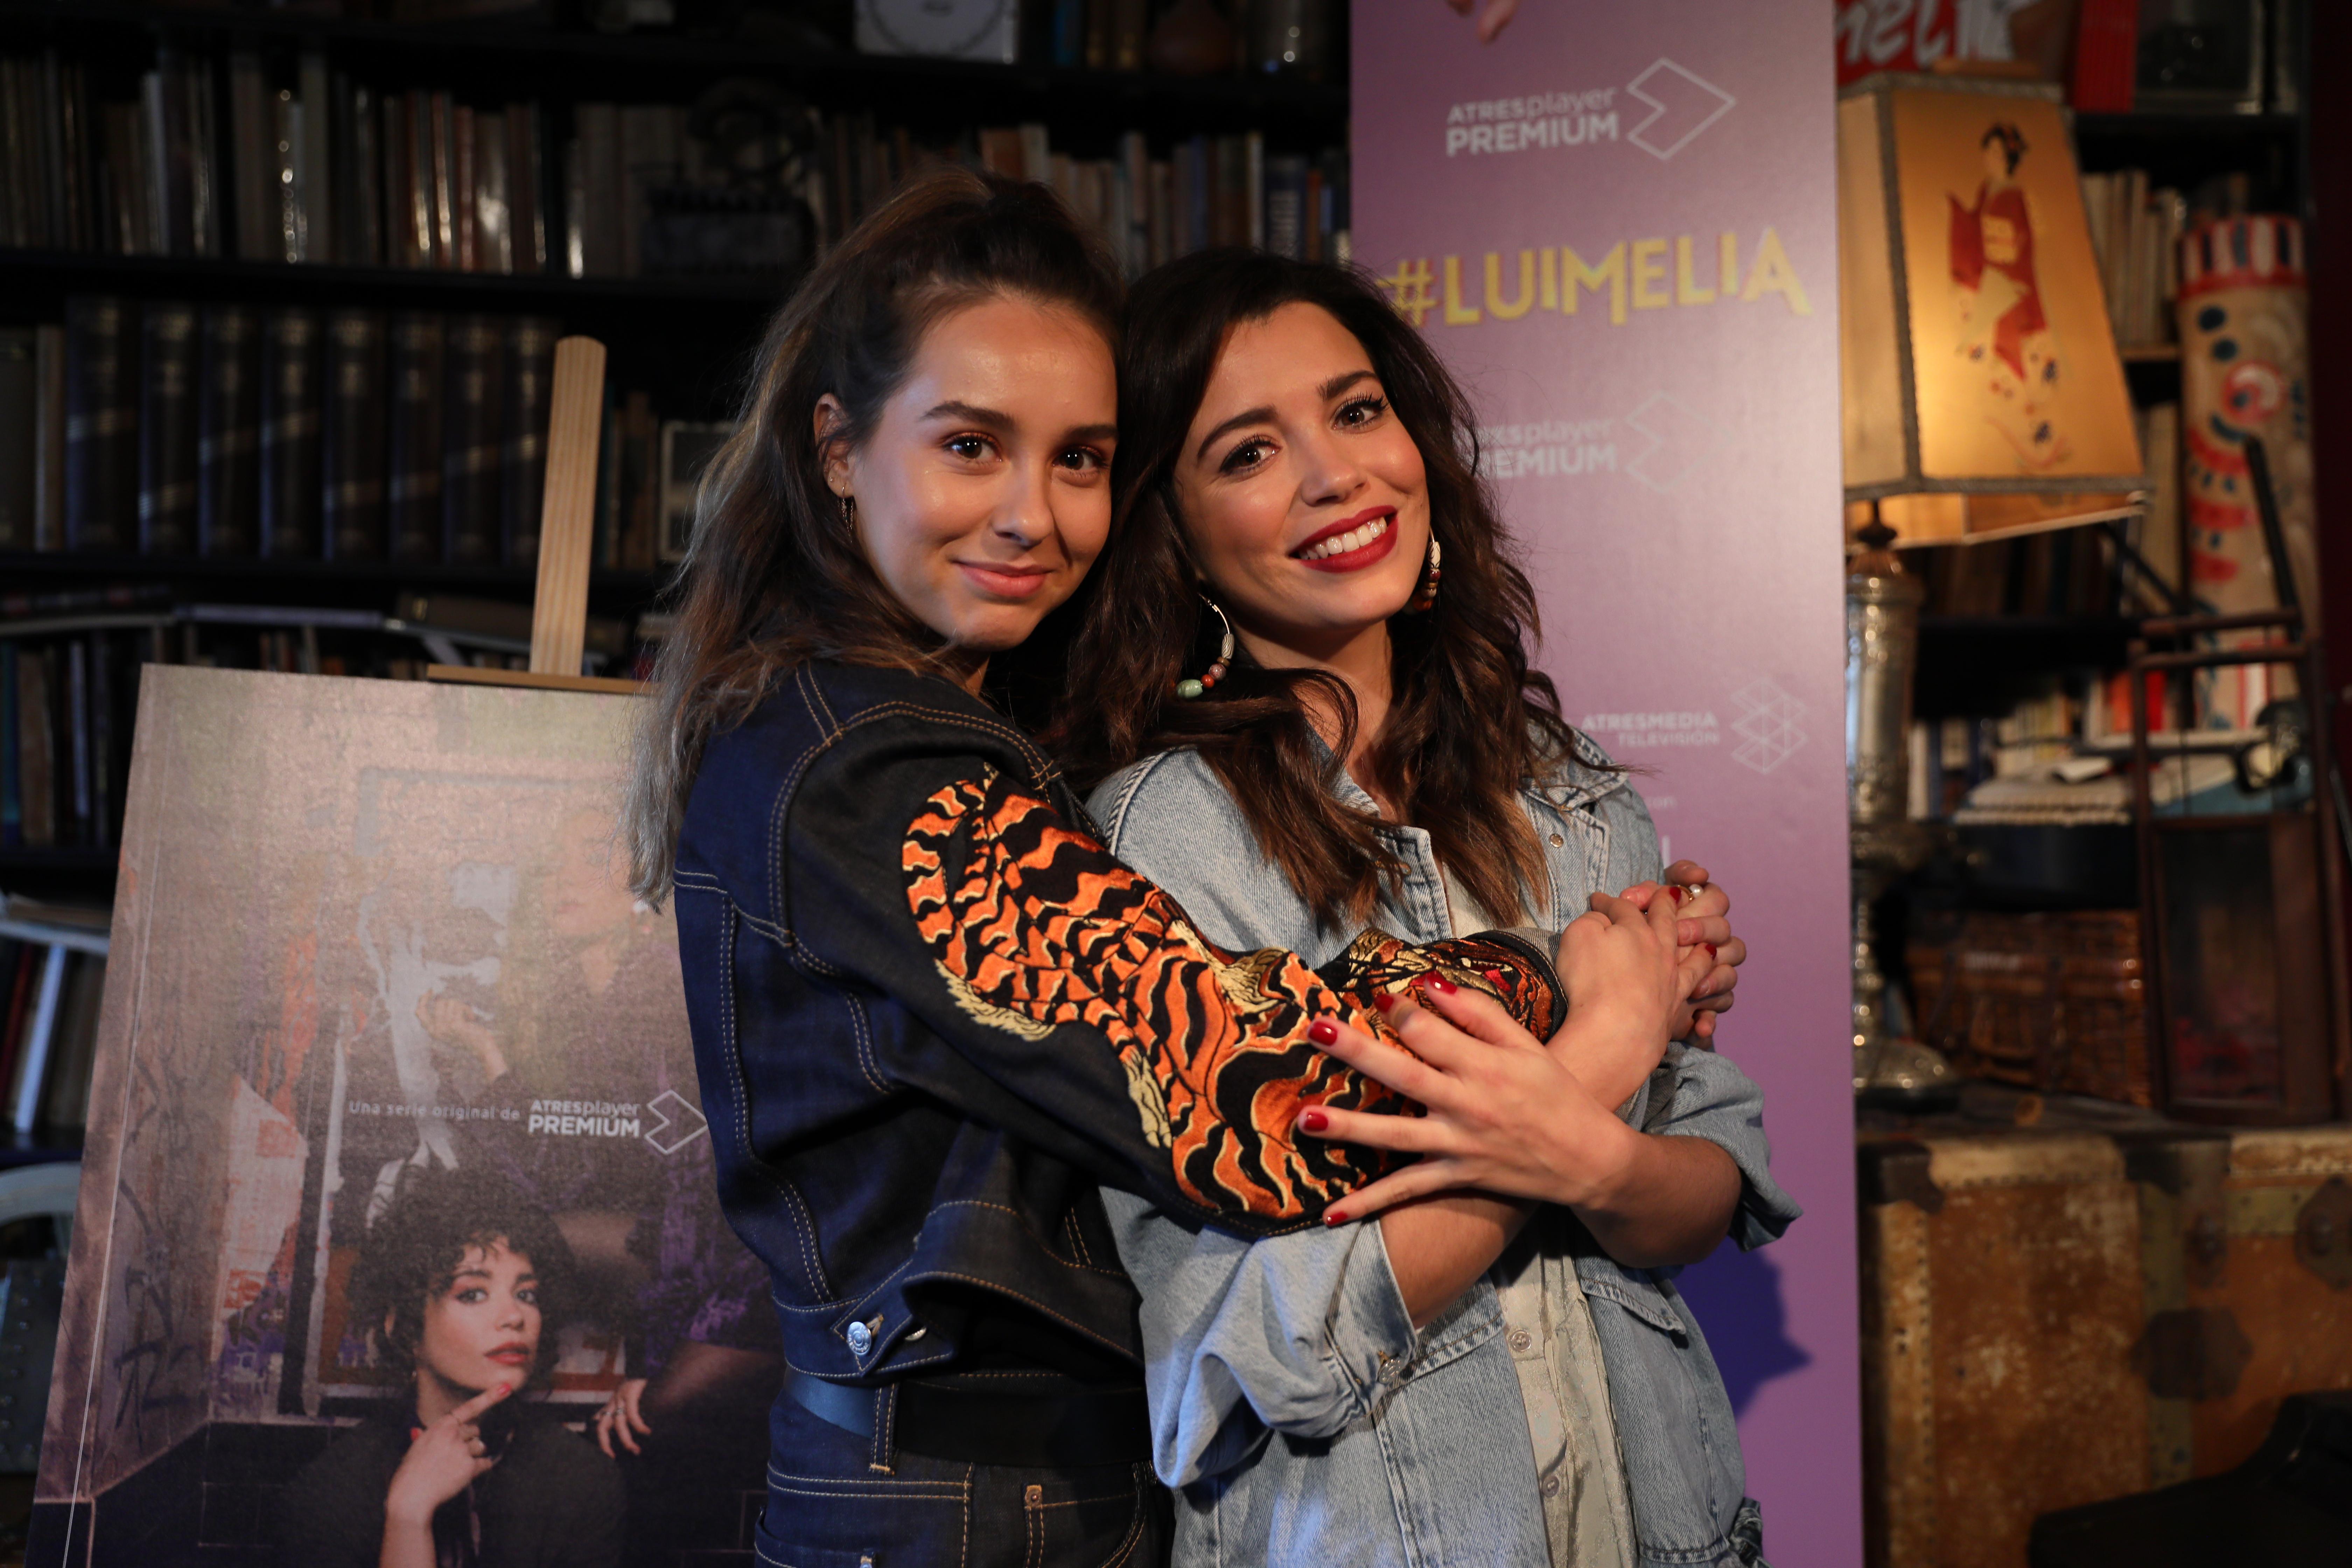 ATRESMEDIA presenta #Luimelia, la nueva serie de ATRESplayer PREMIUM